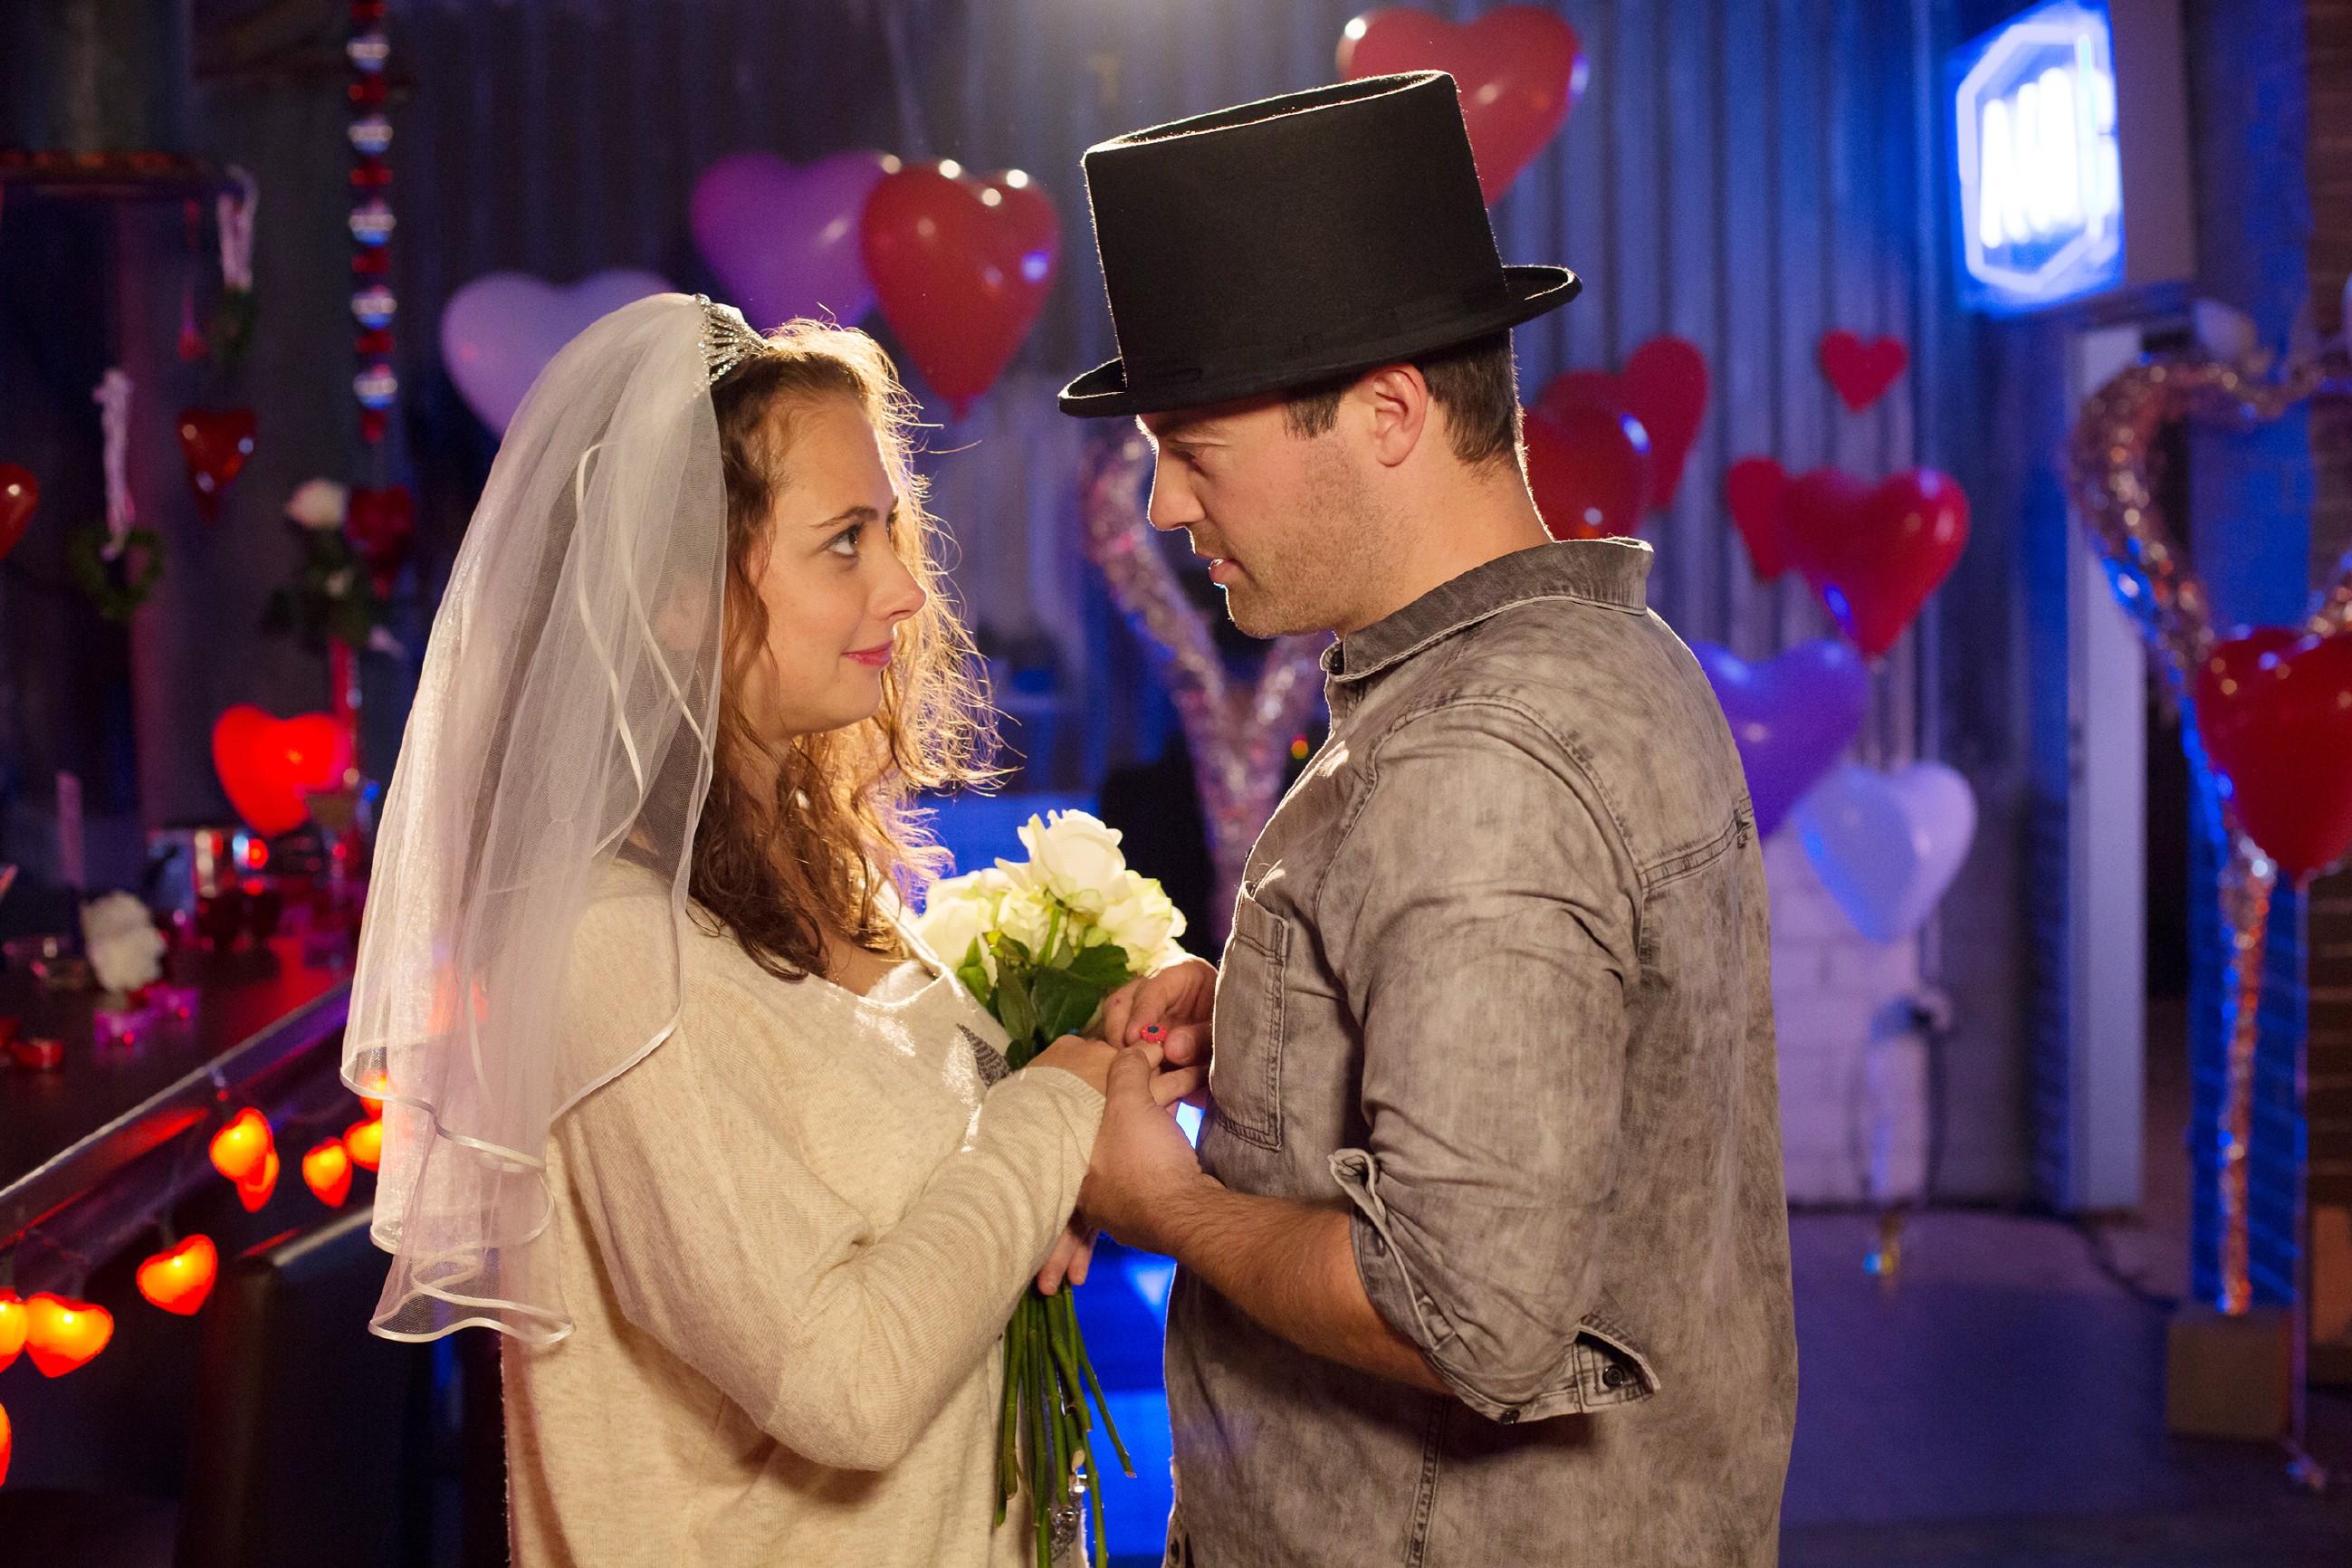 Carmen (Heike Warmuth) nimmt Bens (Jörg Rohde) romantischen Heiratsantrag gerührt an, doch die Feier nimmt ein jähes Ende ... (Quelle: RTL / Michael Böhme)